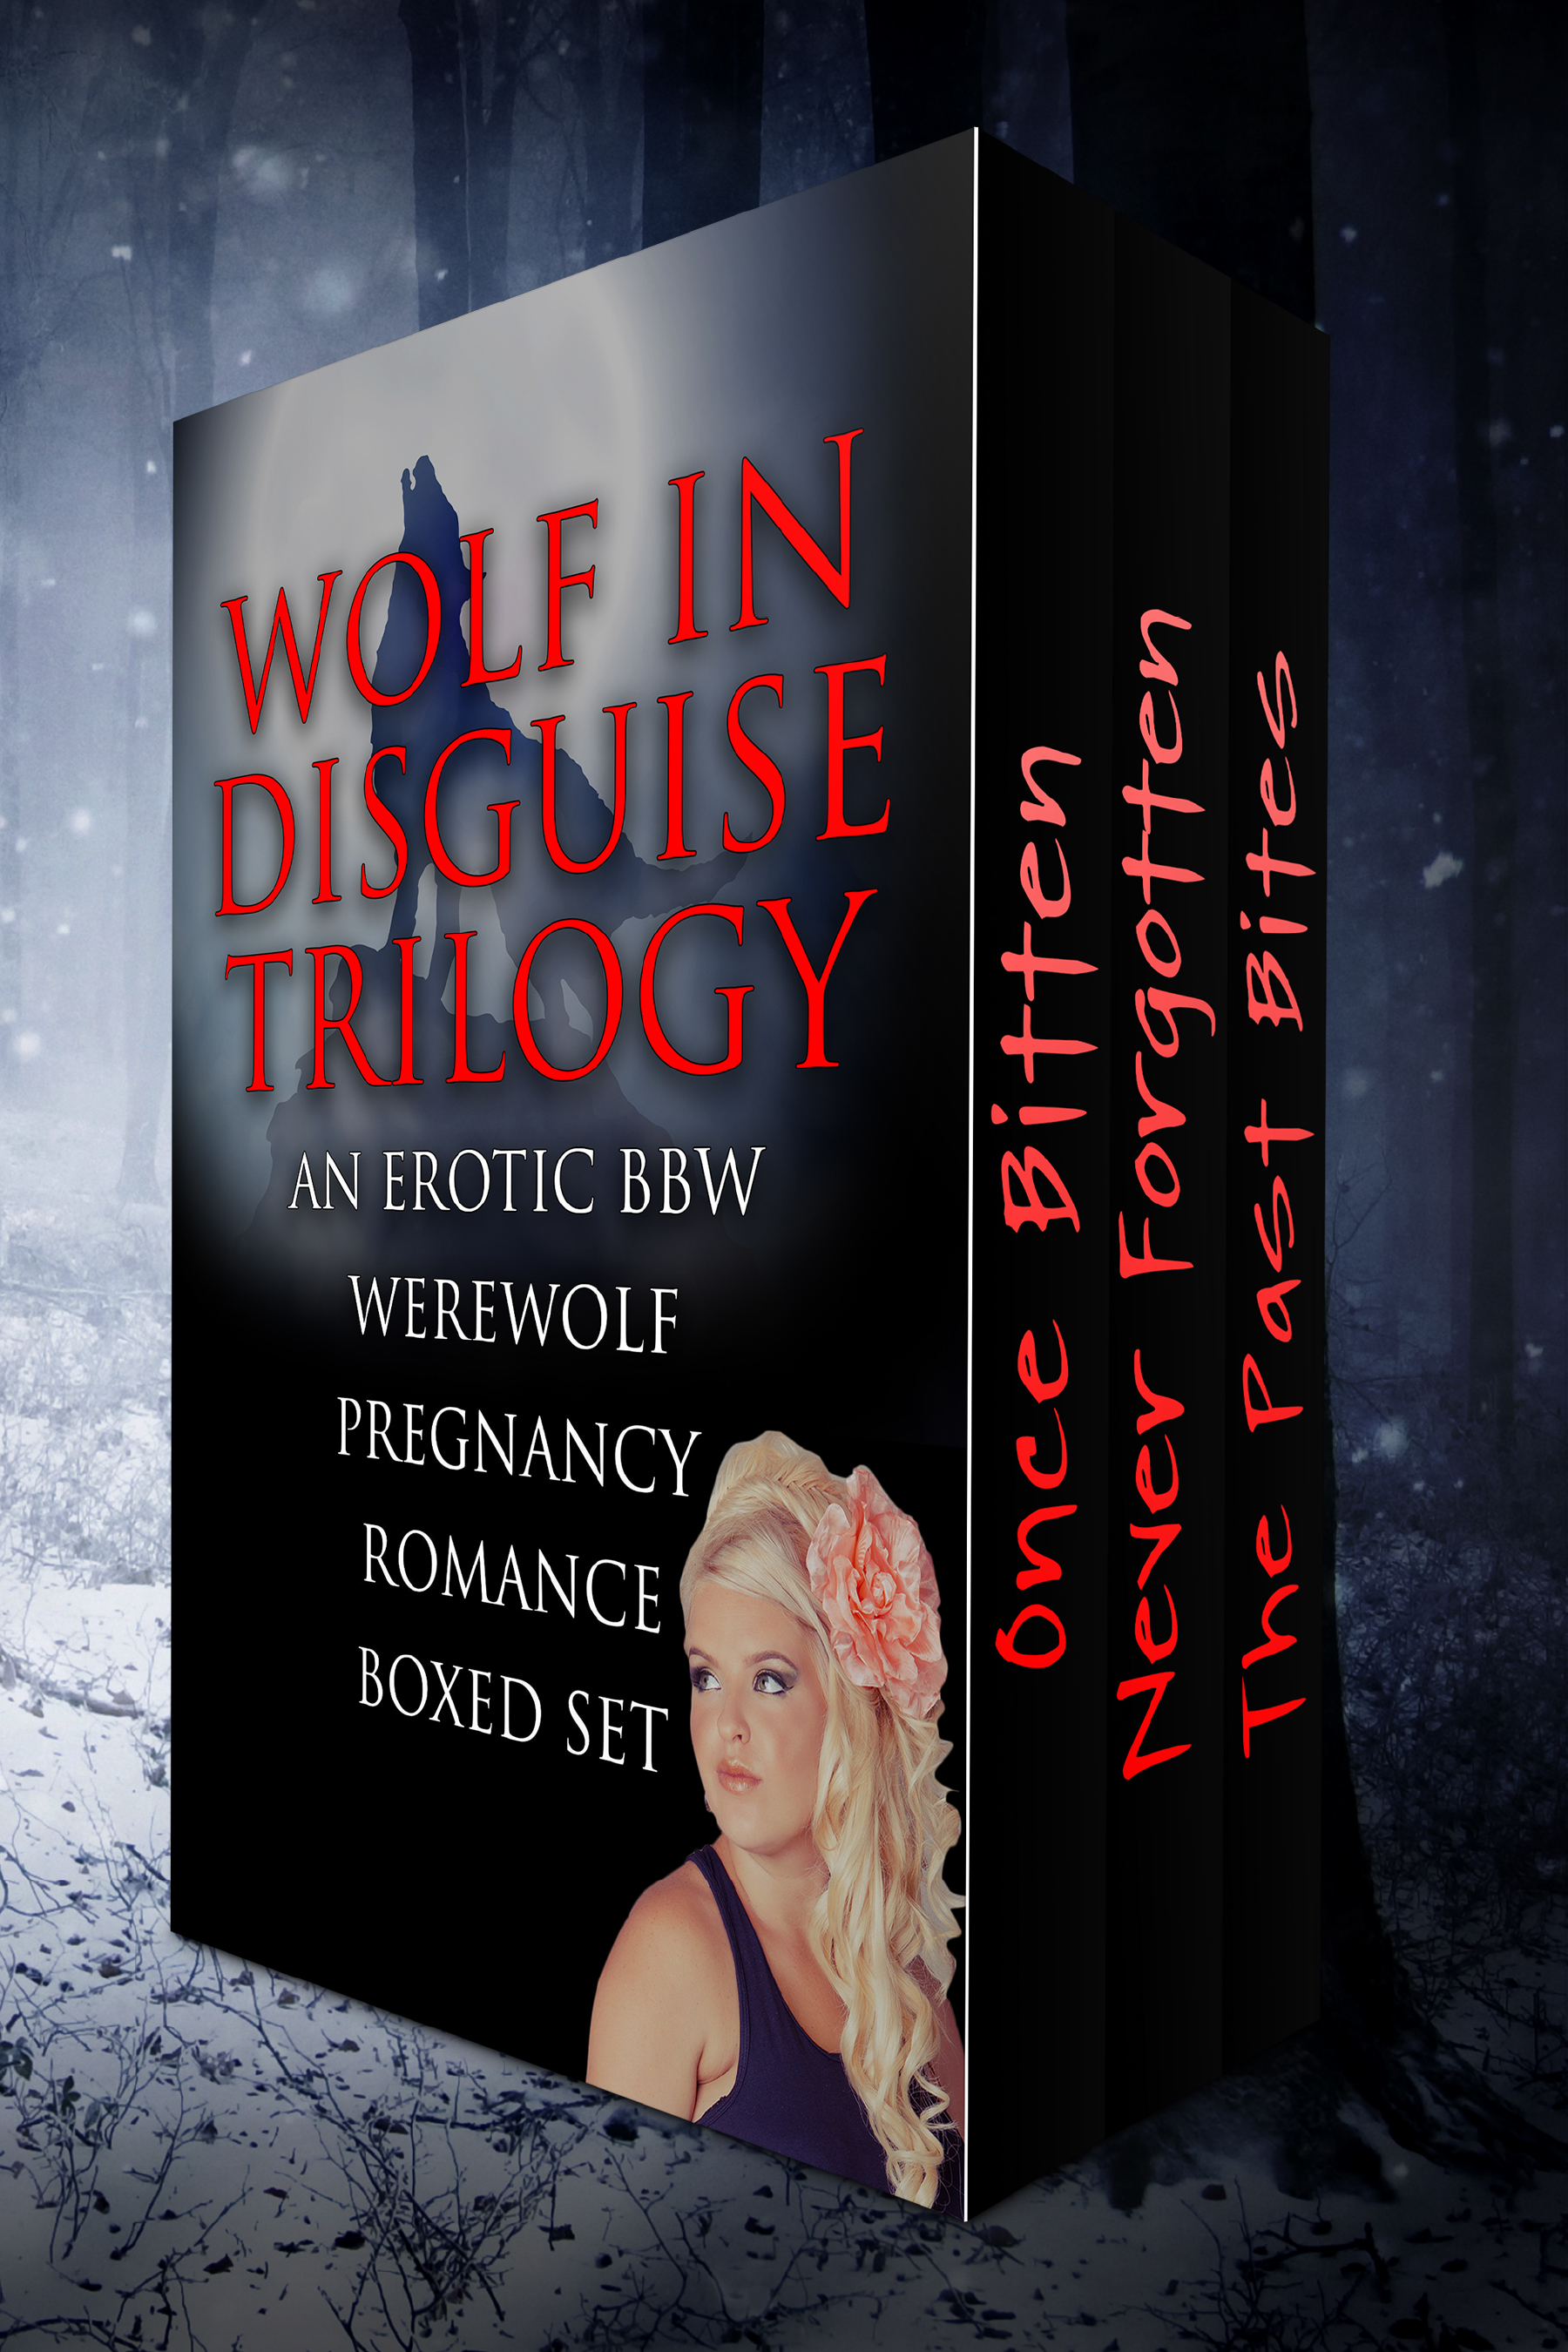 Wolf in disguise trilogy (an erotic bbw werewolf pregnancy romance boxed set)